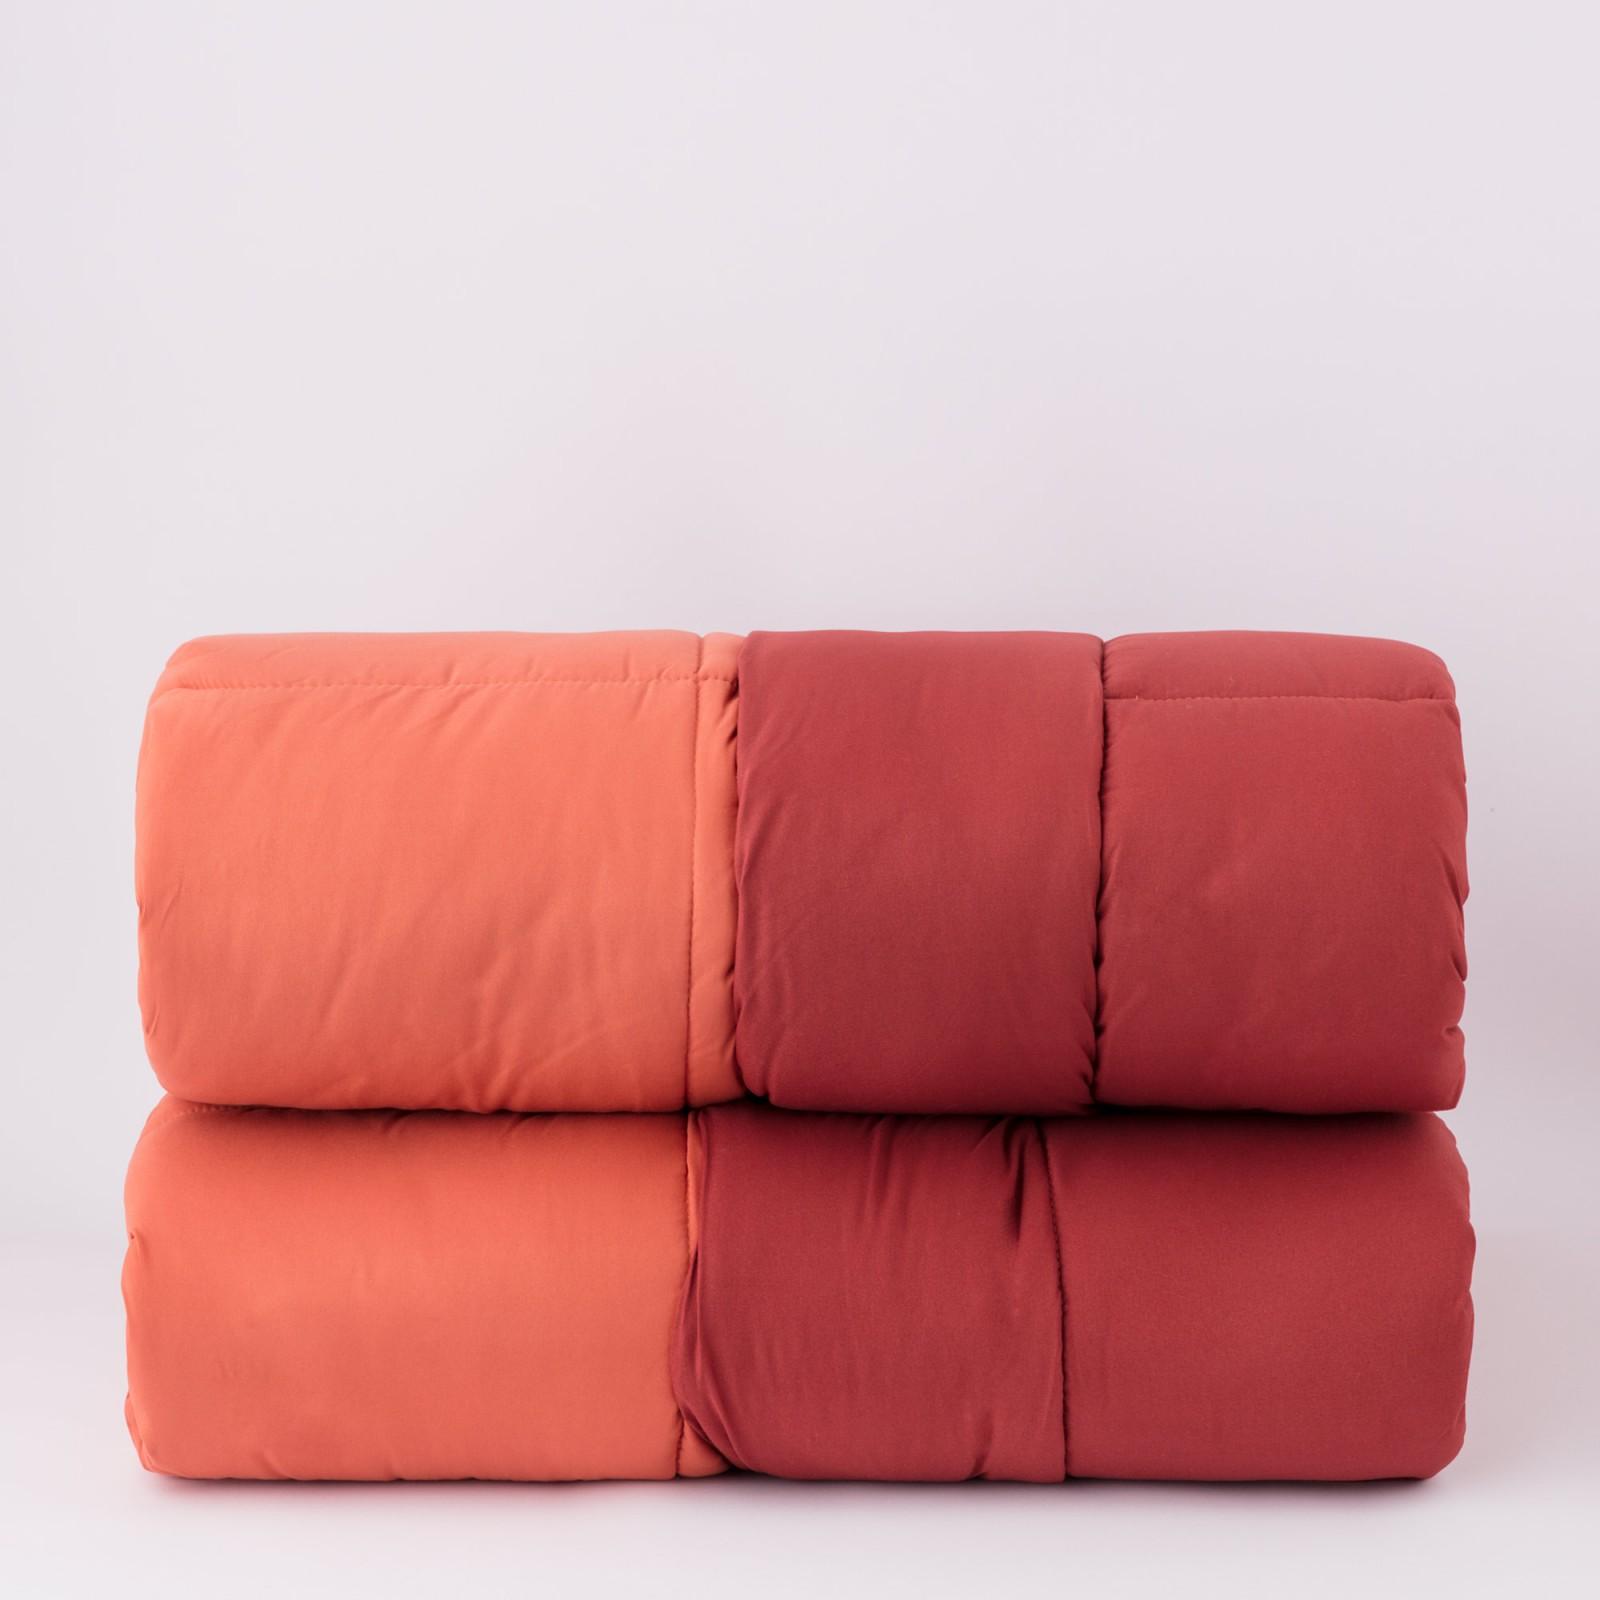 Jacquard Dallas Towel set 1+1